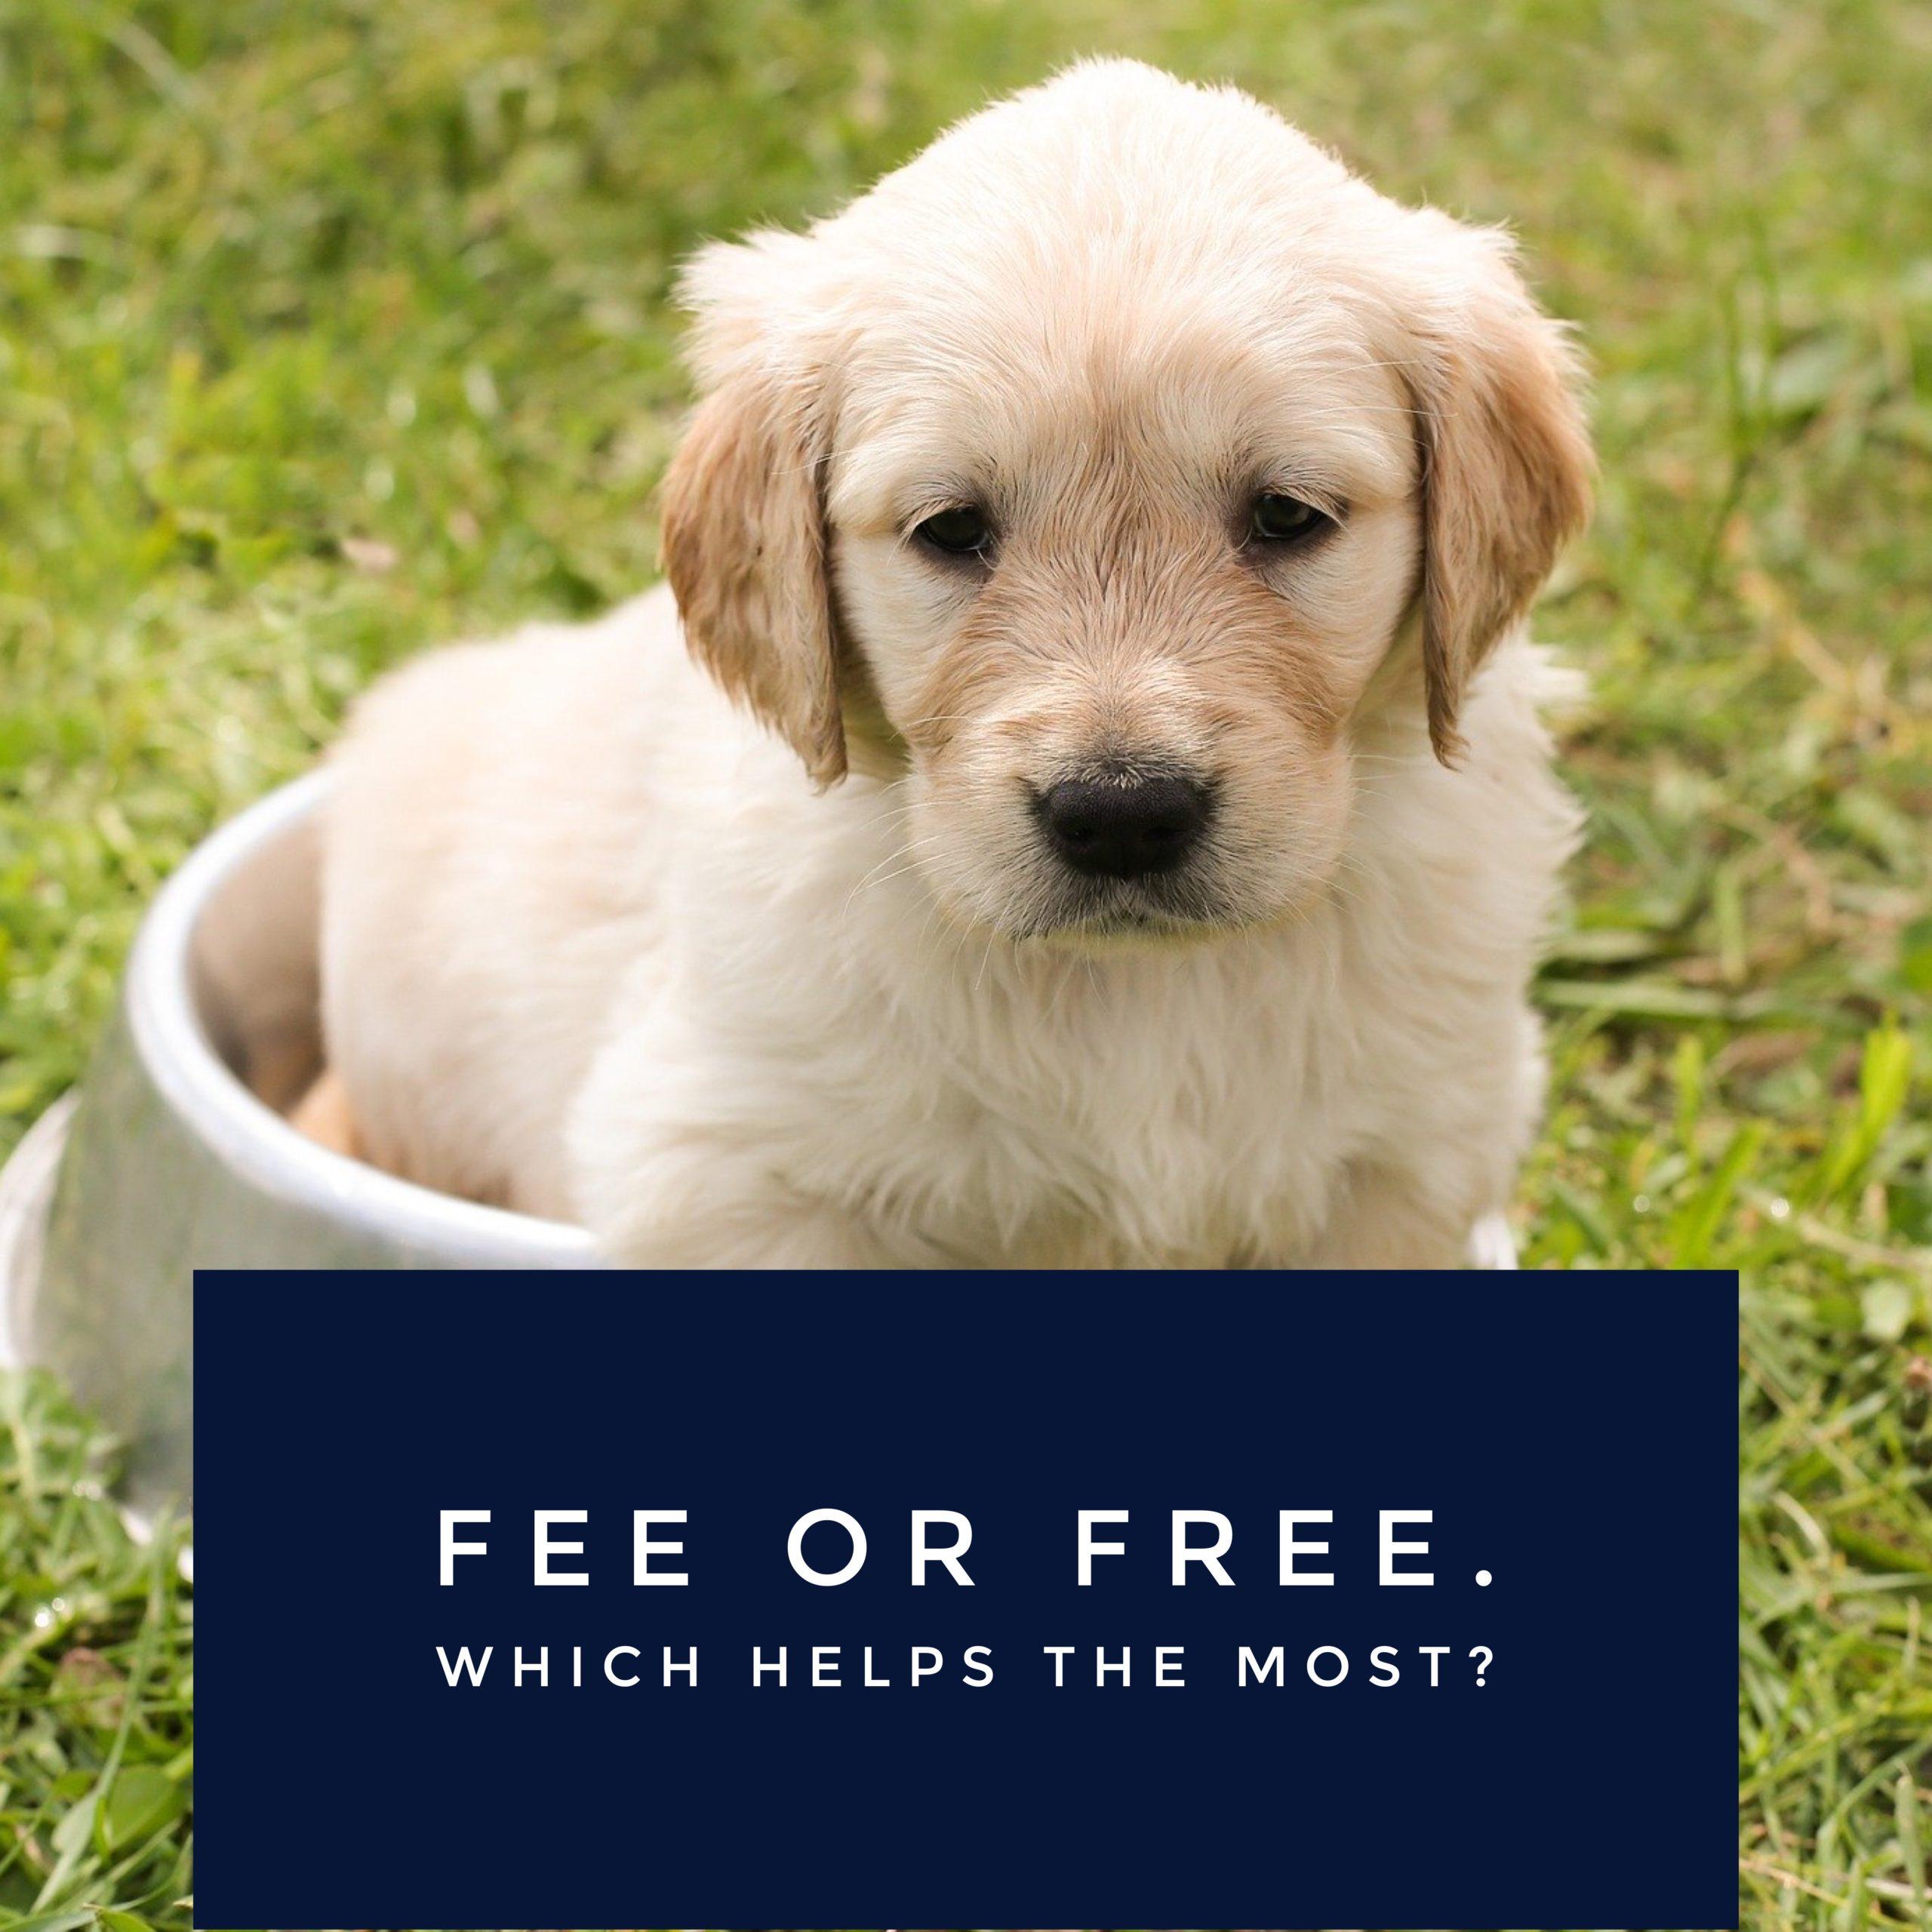 Fee or Free?